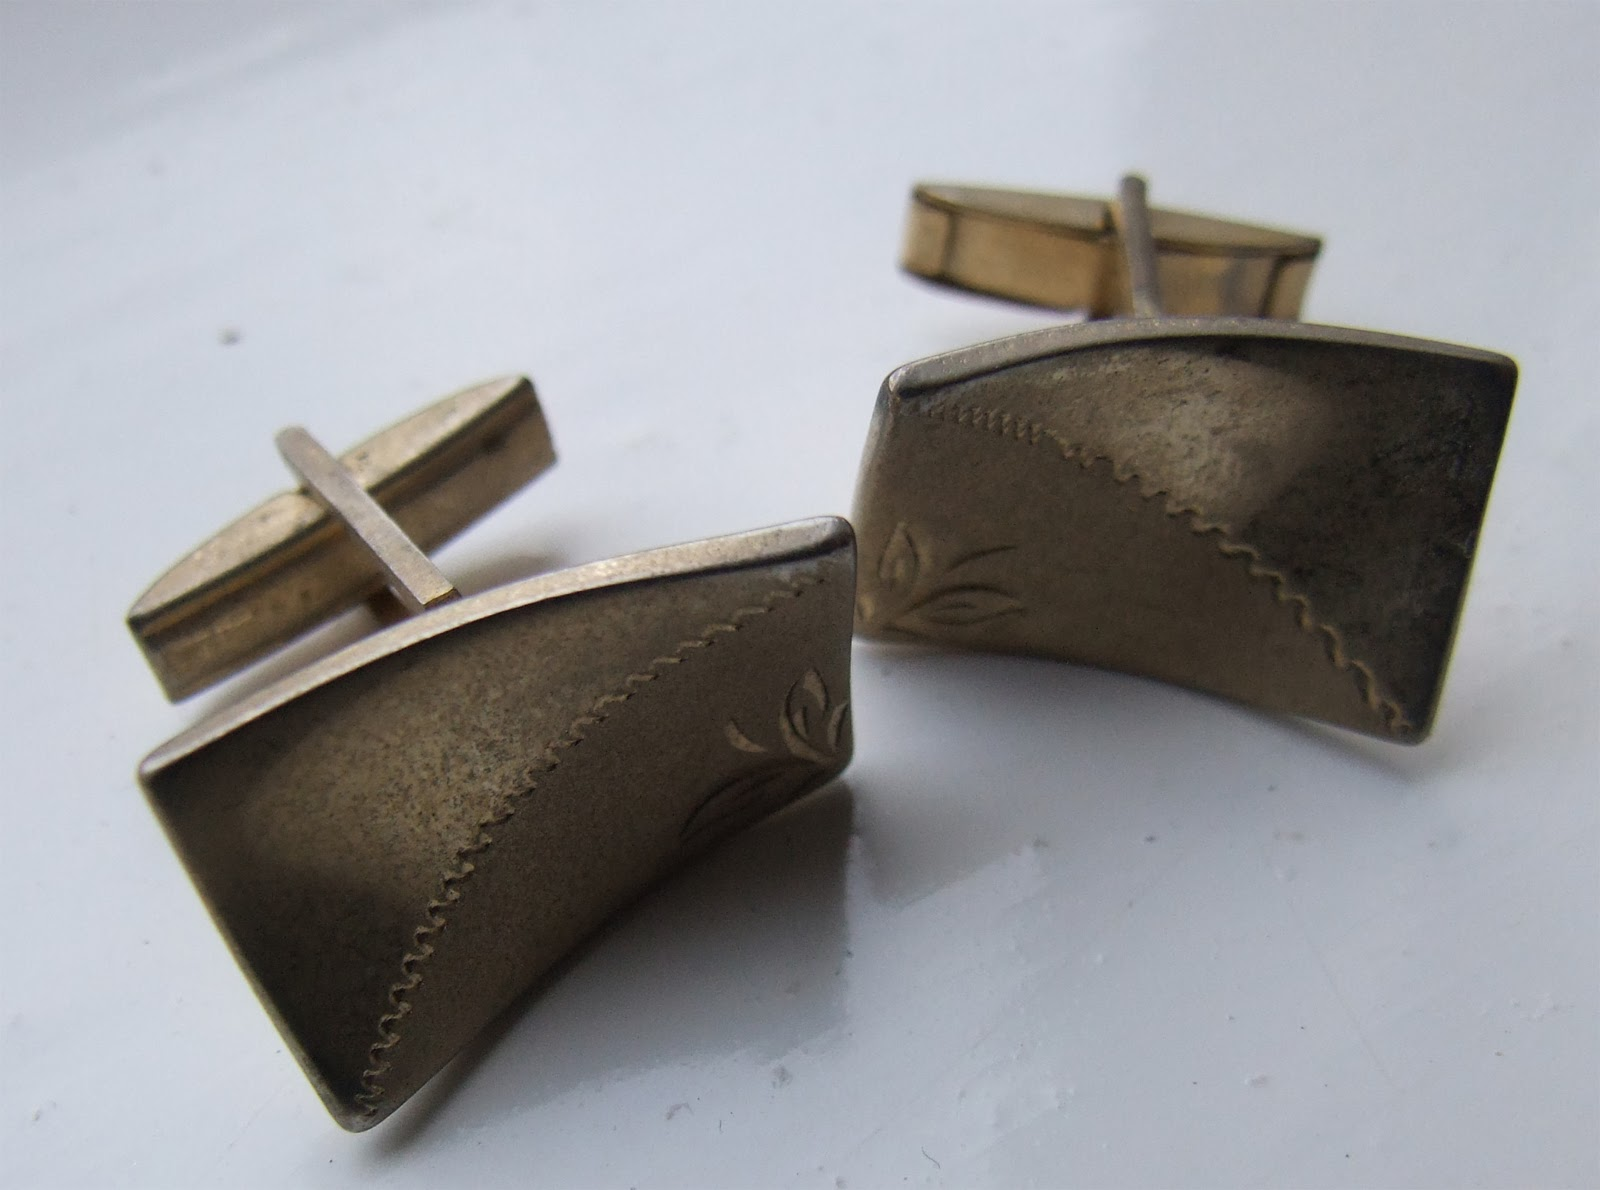 Antique and Vintage Costume Jewellery: Vintage Men's Tie ...